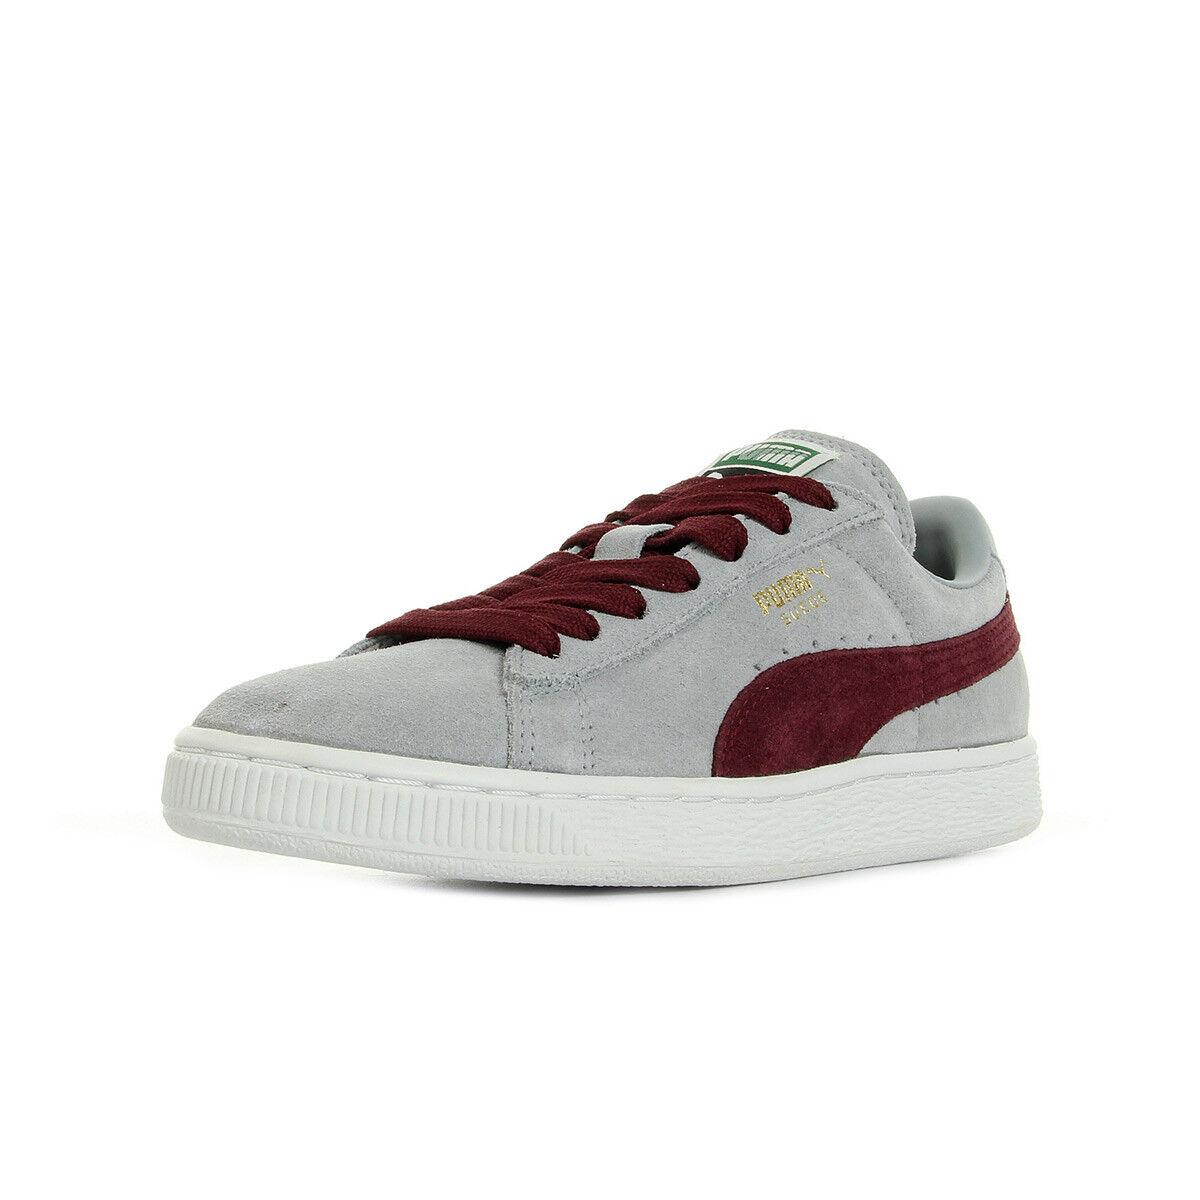 Zapatos Classic Baskets Puma unisexe Ante Classic Zapatos + taille Bordeaux Cuir Lacets 34eb6e